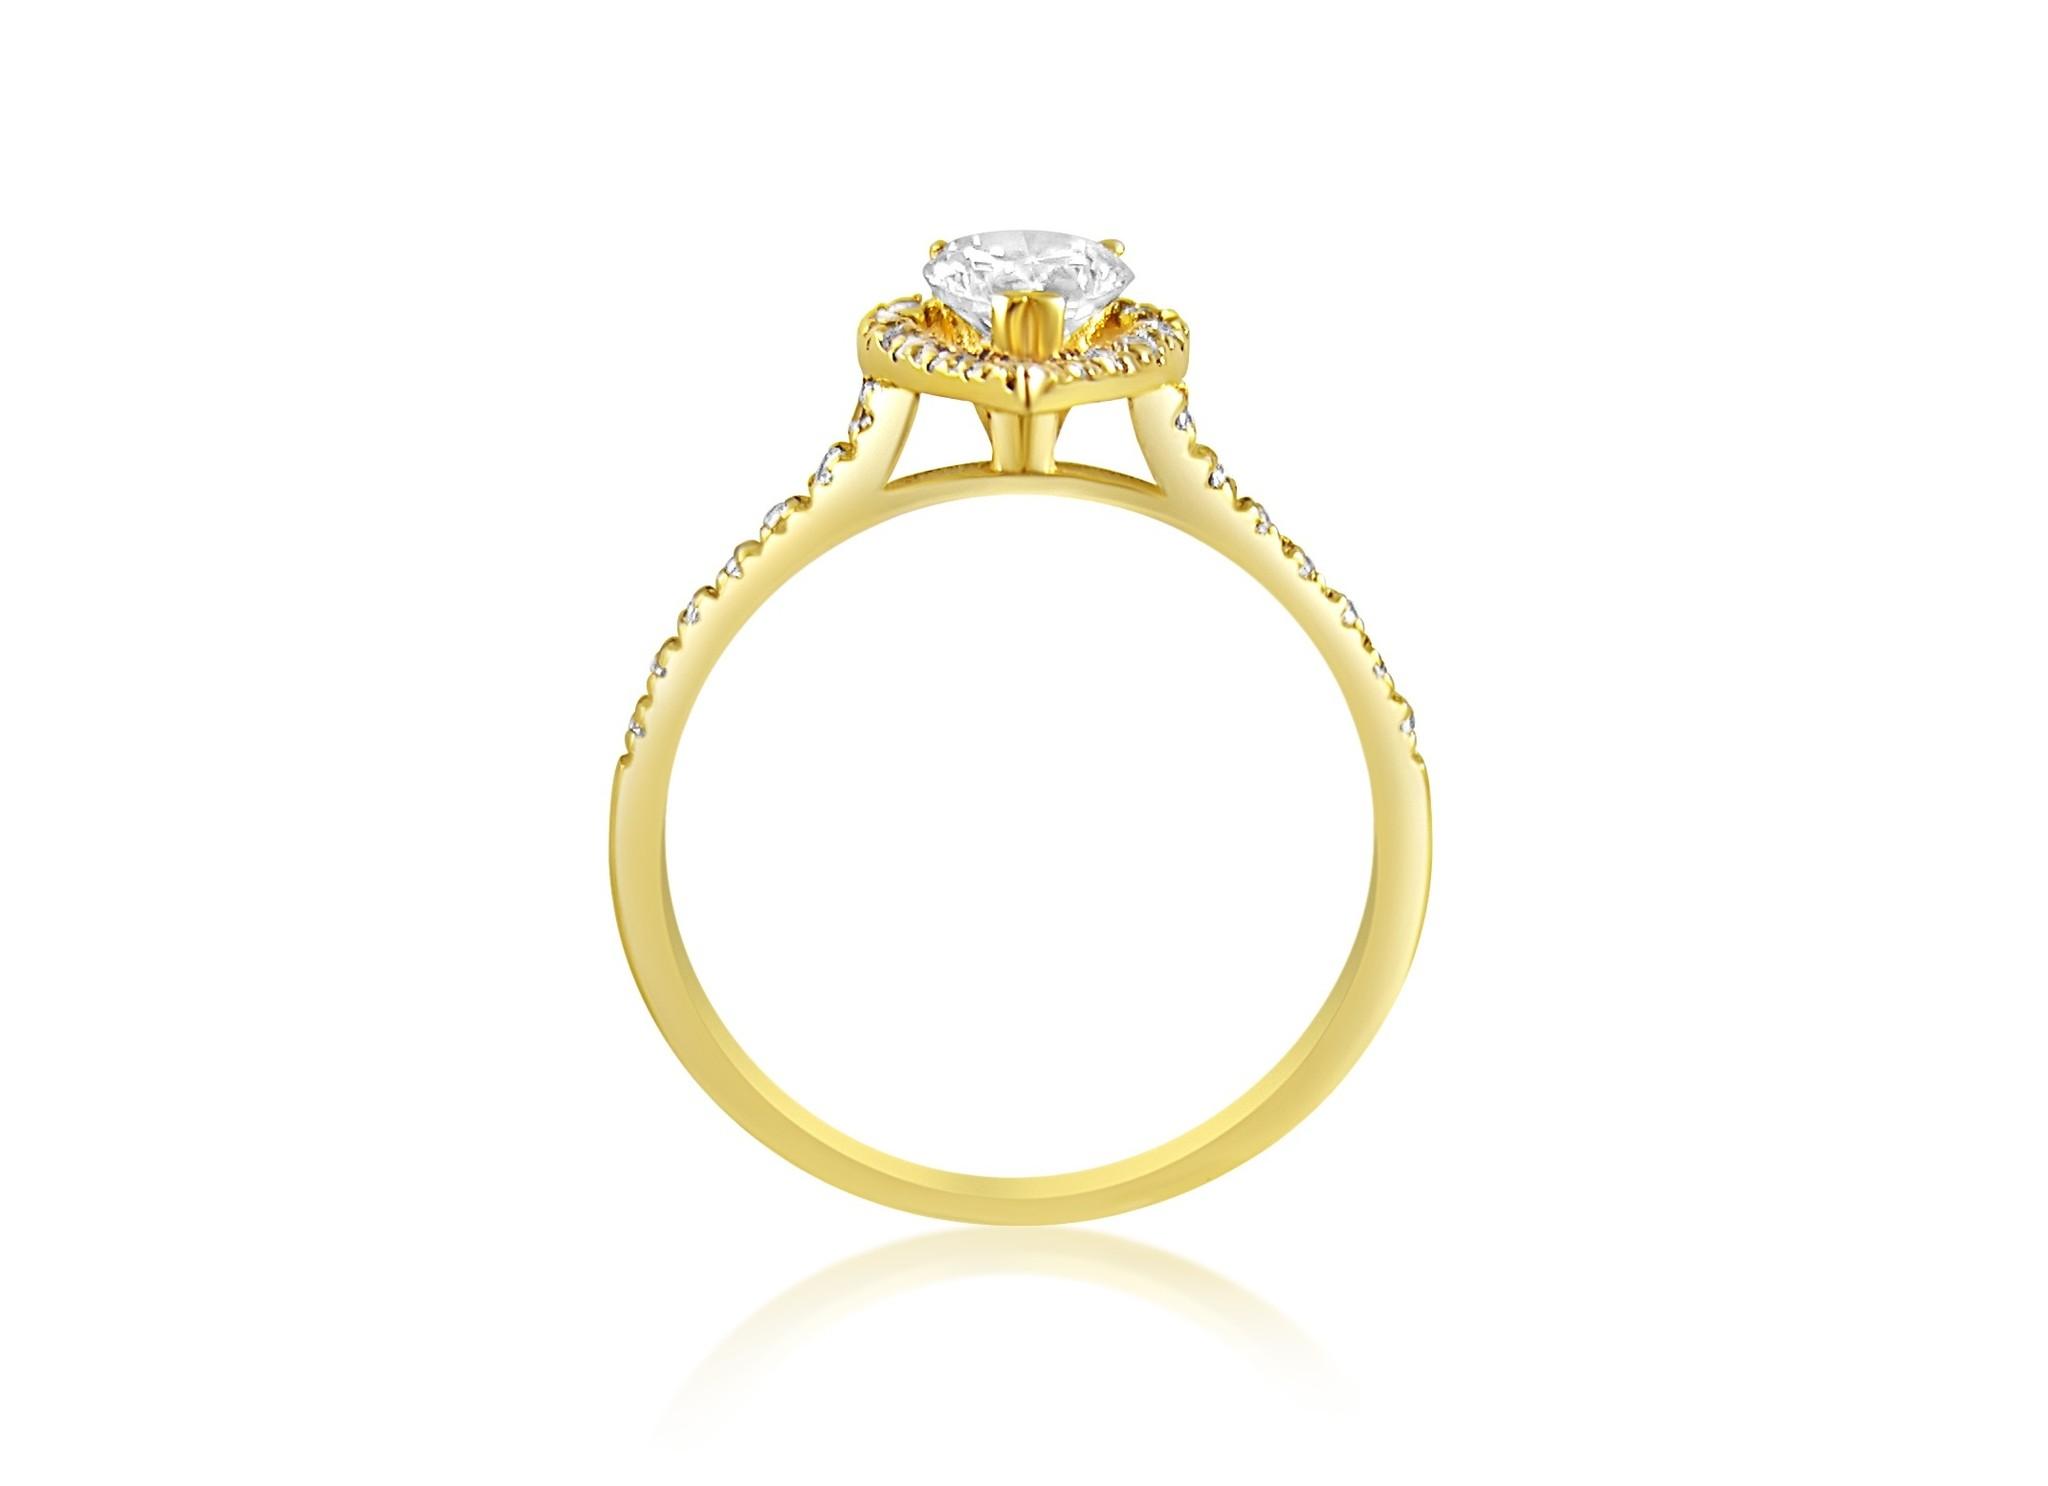 18 karat yellow gold engagement ring with zirconia